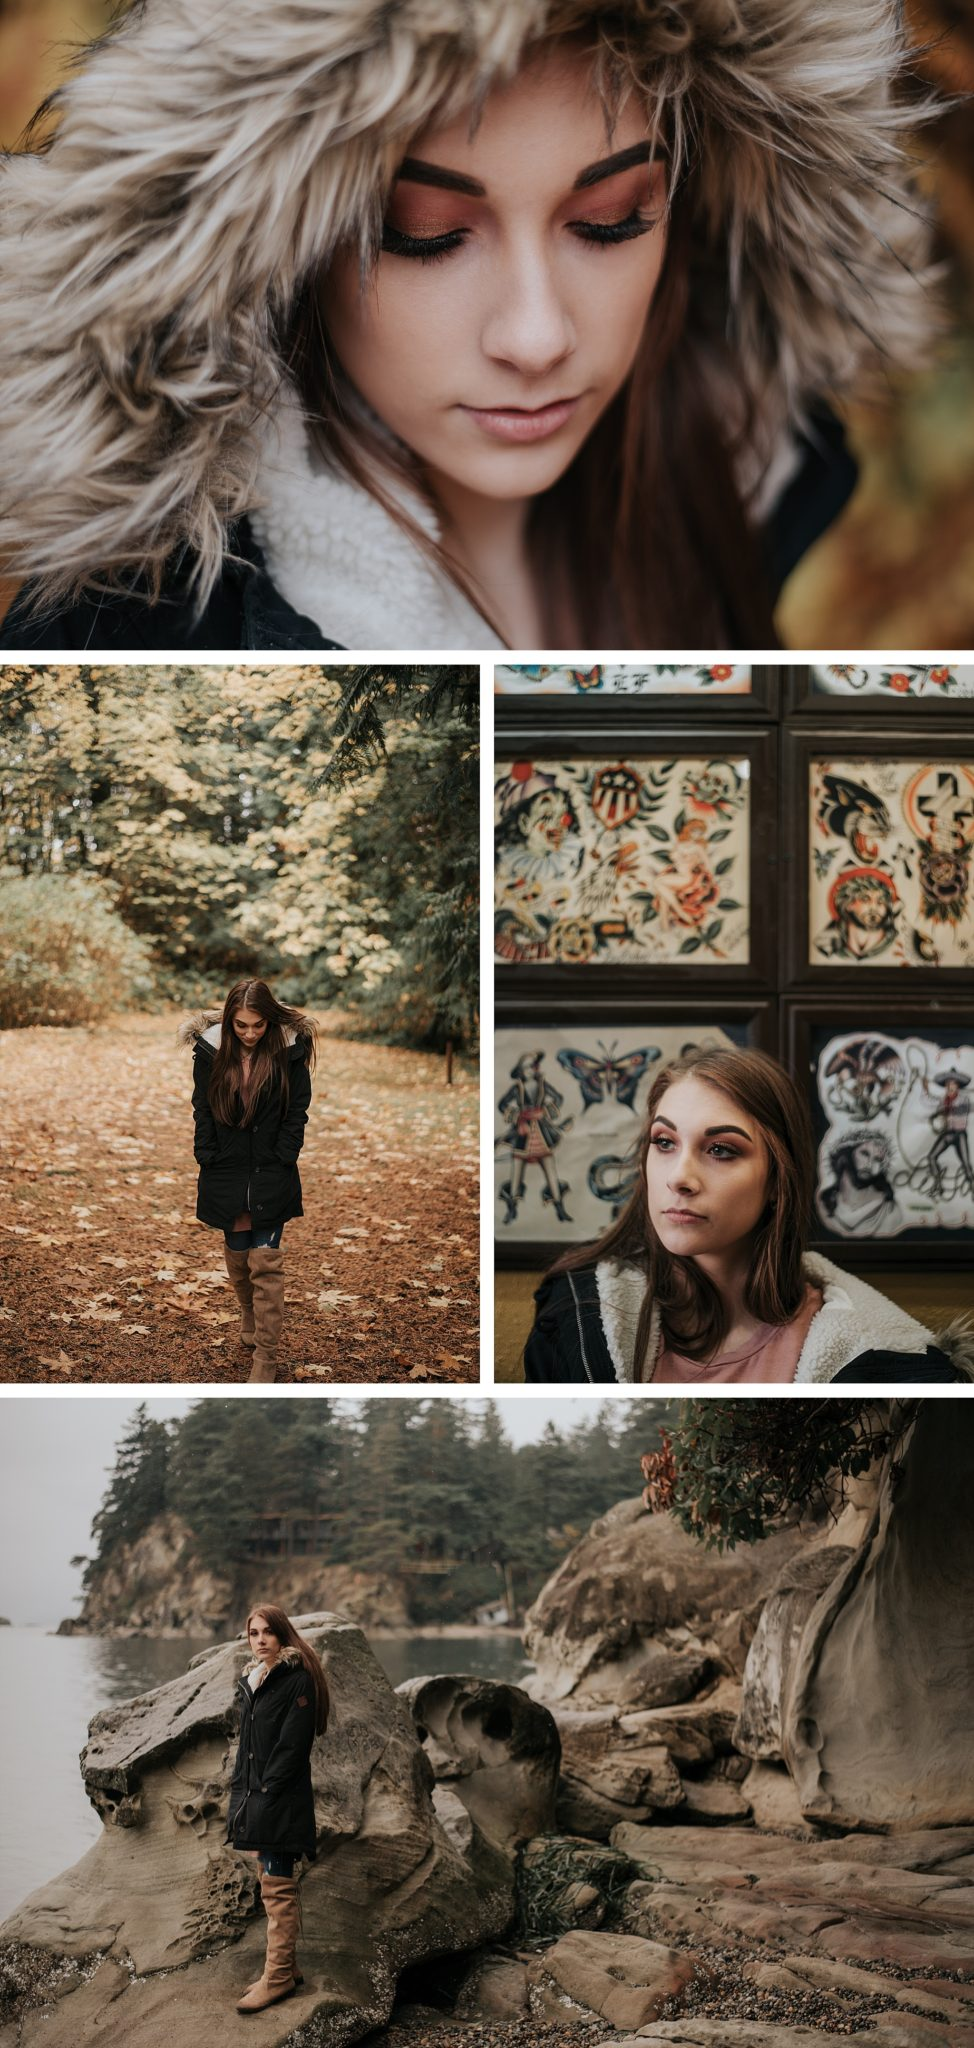 Best of 2017 in portraits: Stephanie Acar, Photographer